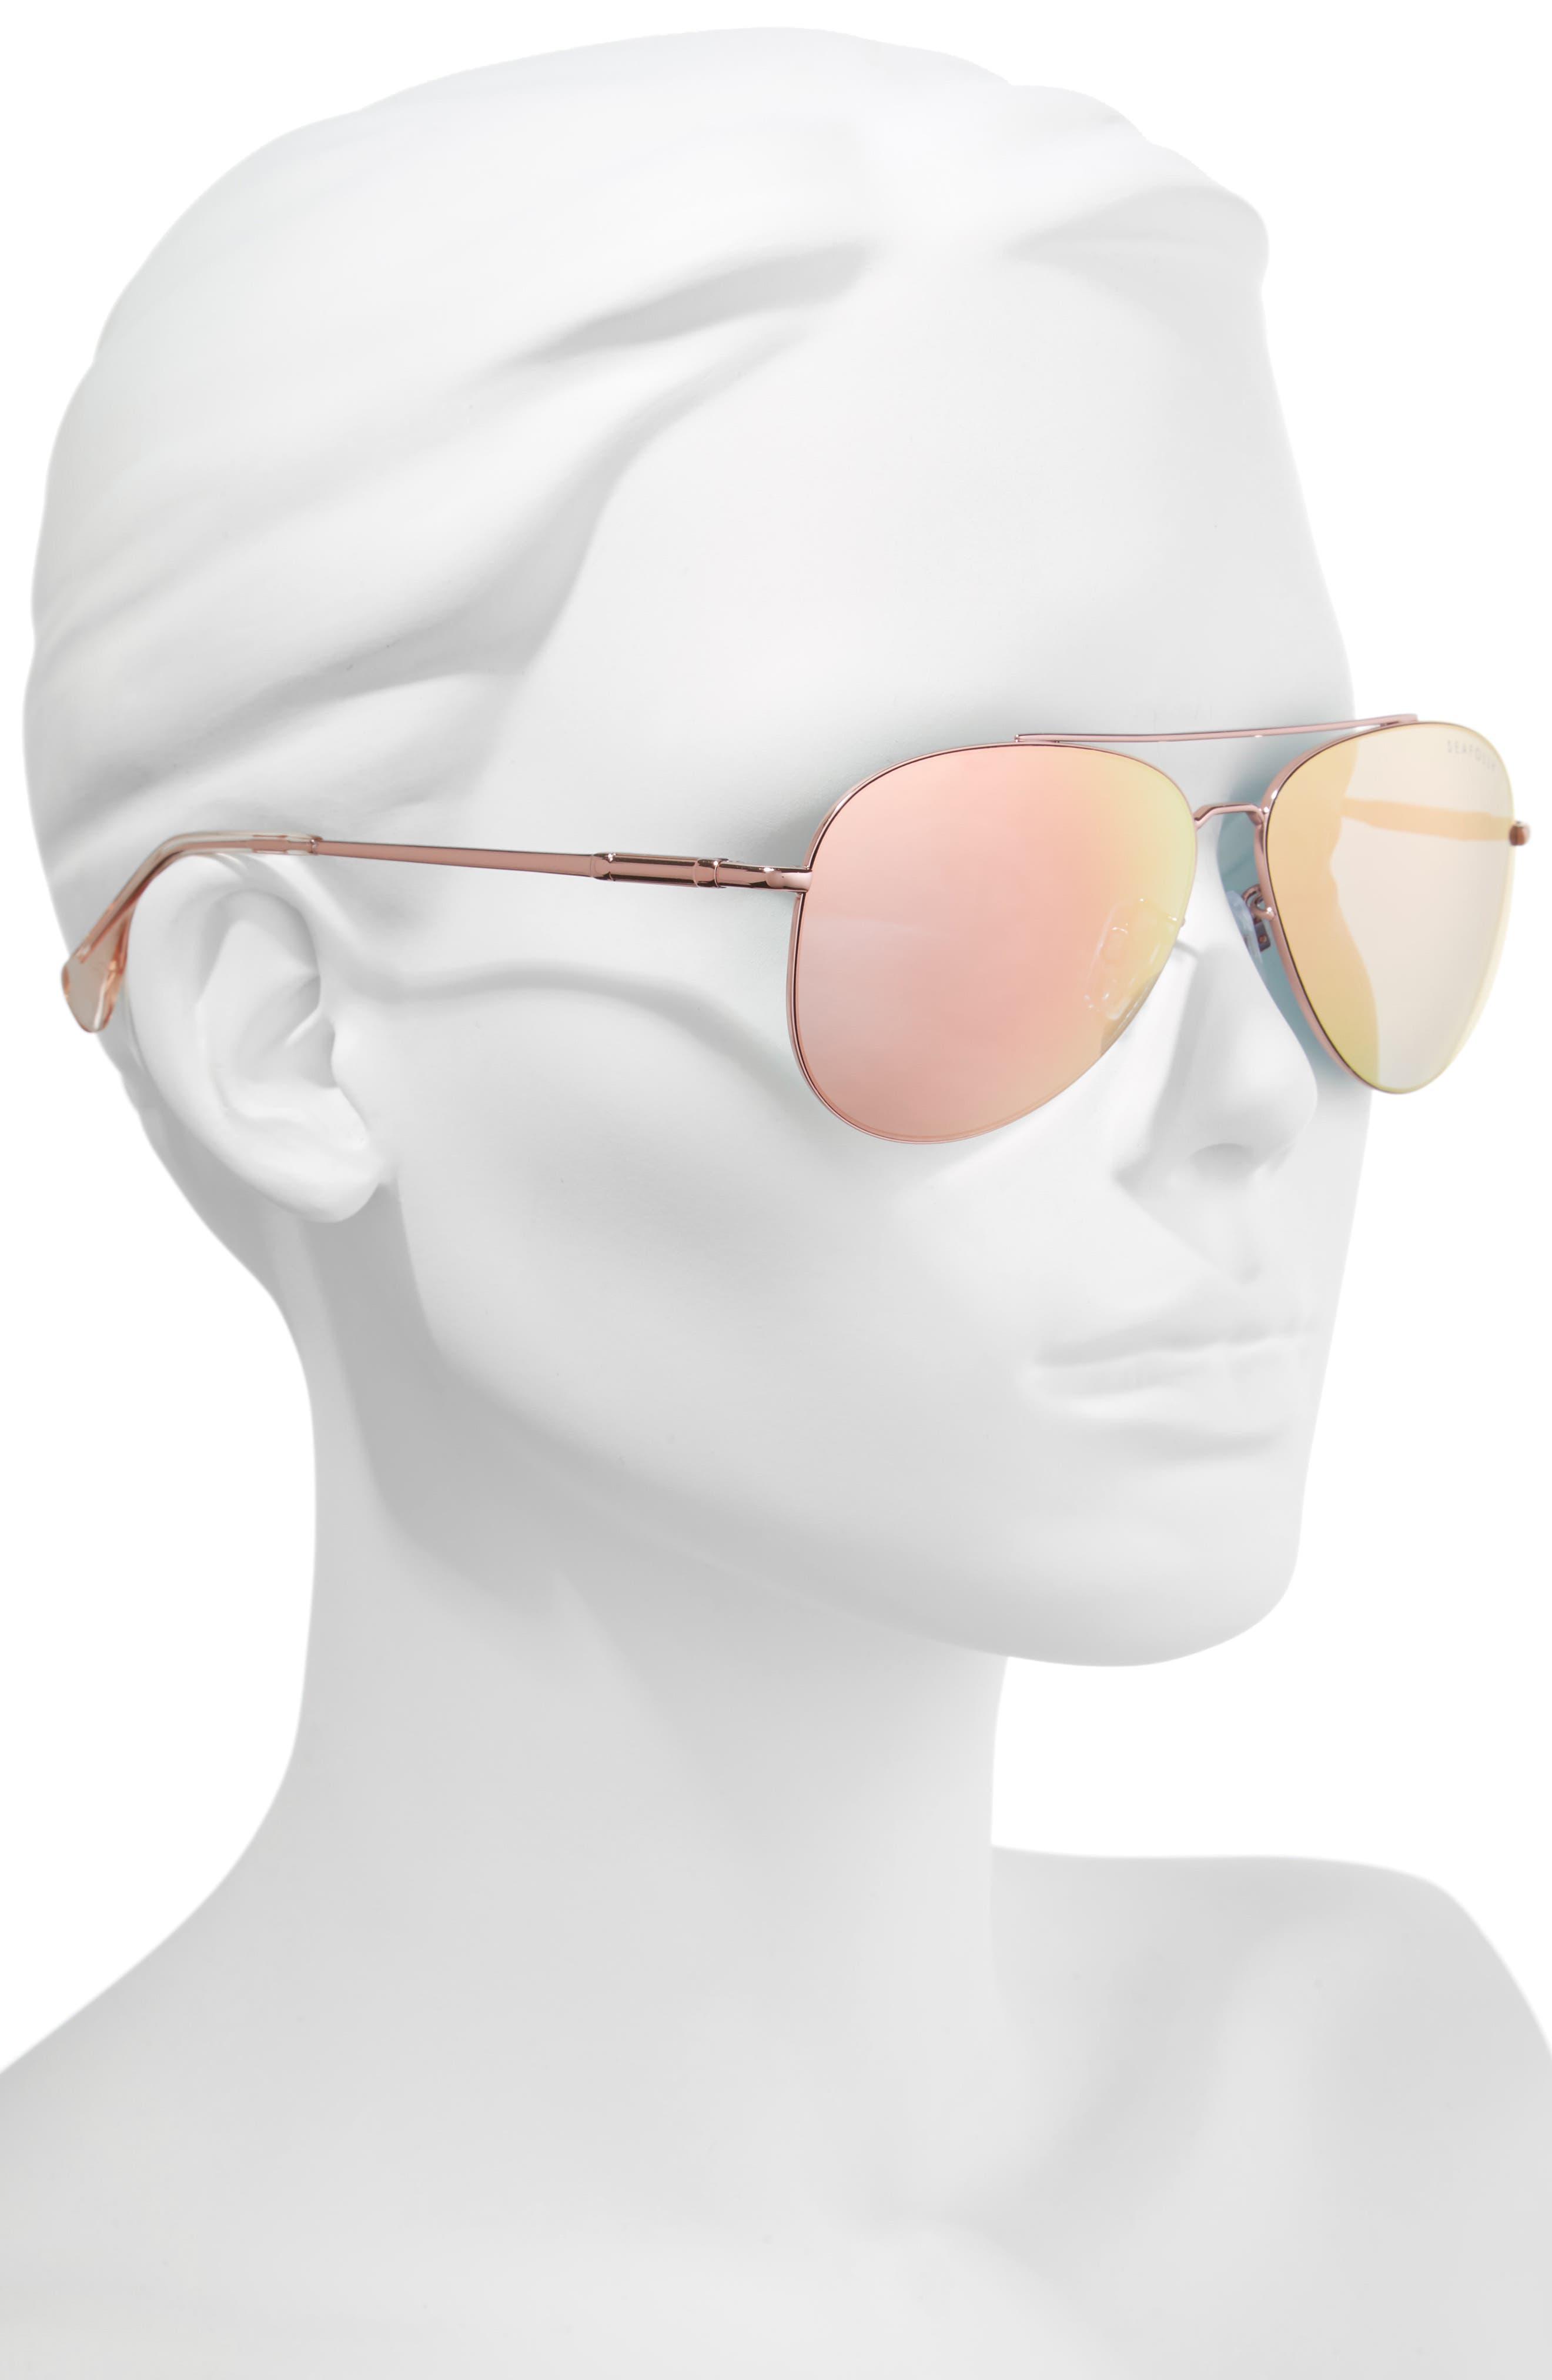 Hiva Oa 58mm Aviator Sunglasses,                             Alternate thumbnail 2, color,                             BALLET